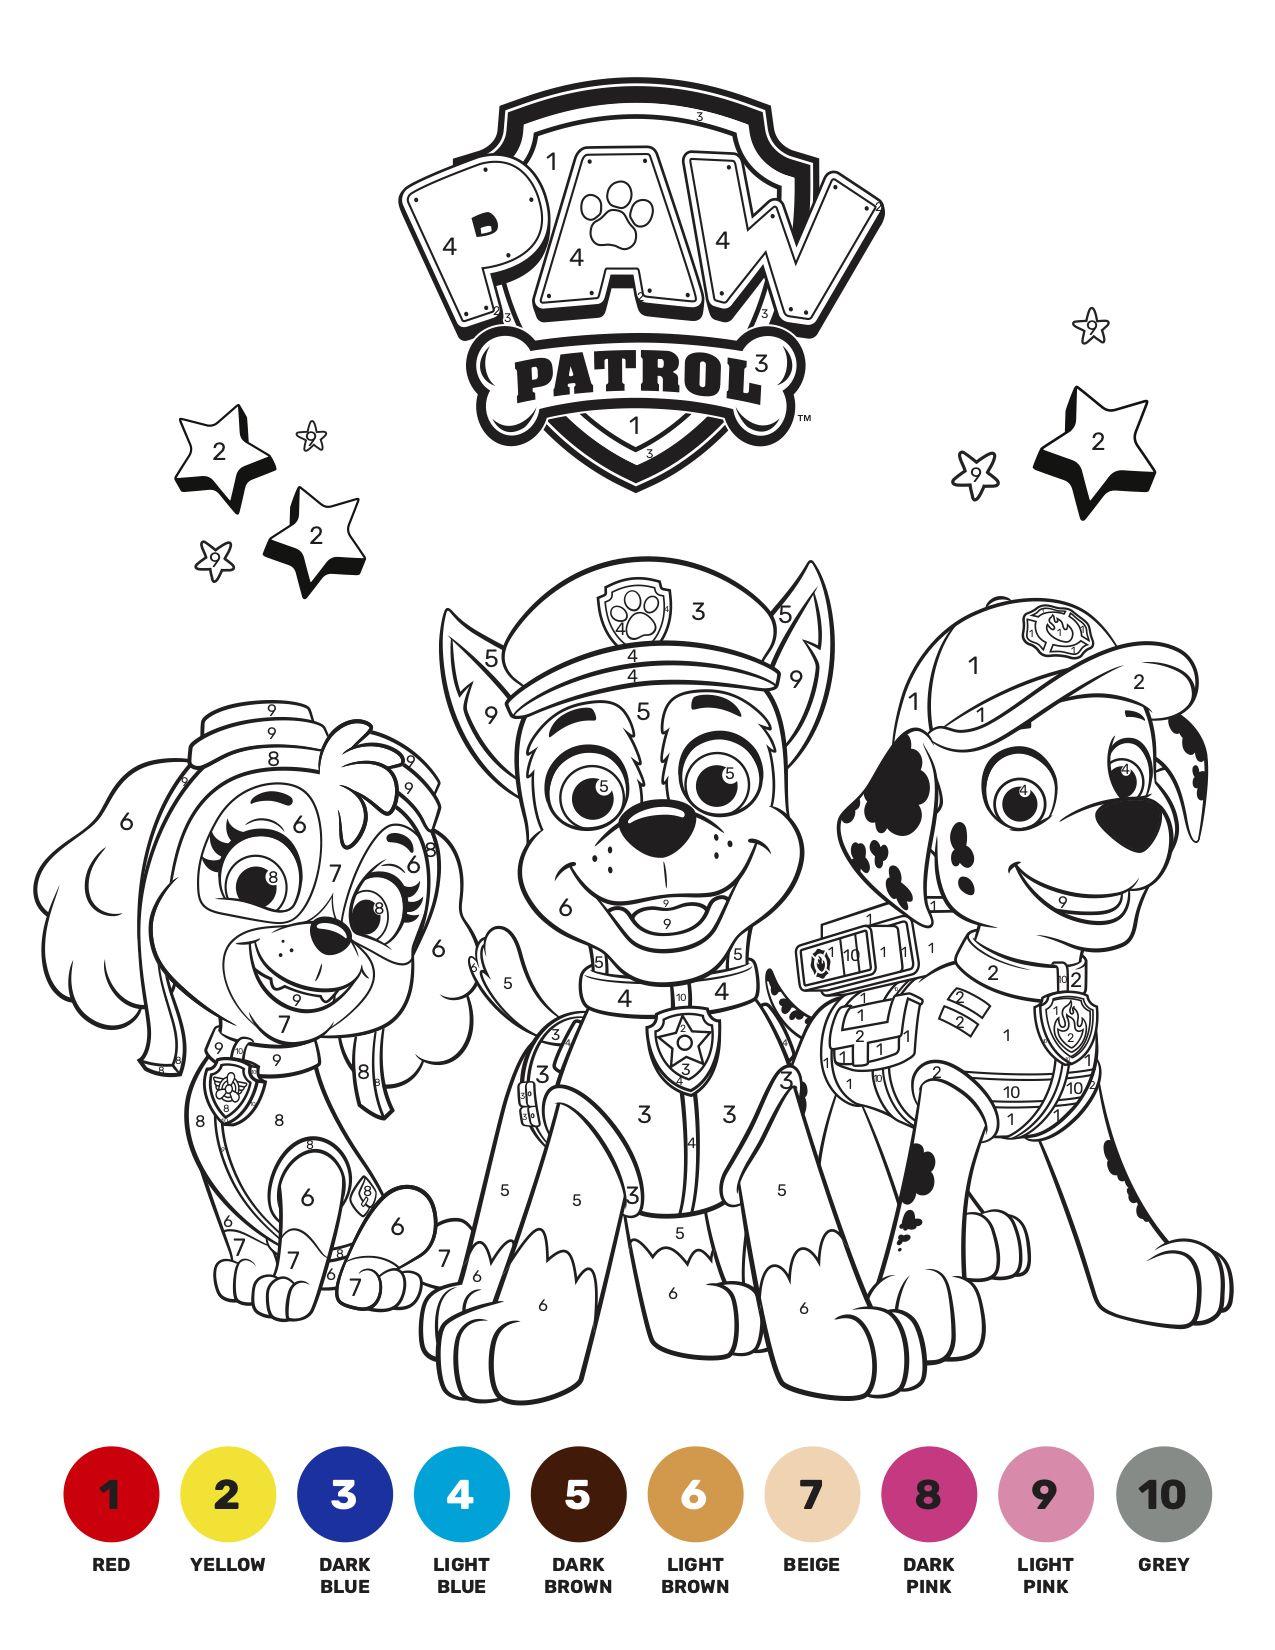 Paw Patrol Coloring Page Paw Patrol Coloring Pages Paw Patrol Coloring Coloring Pages [ 1650 x 1275 Pixel ]